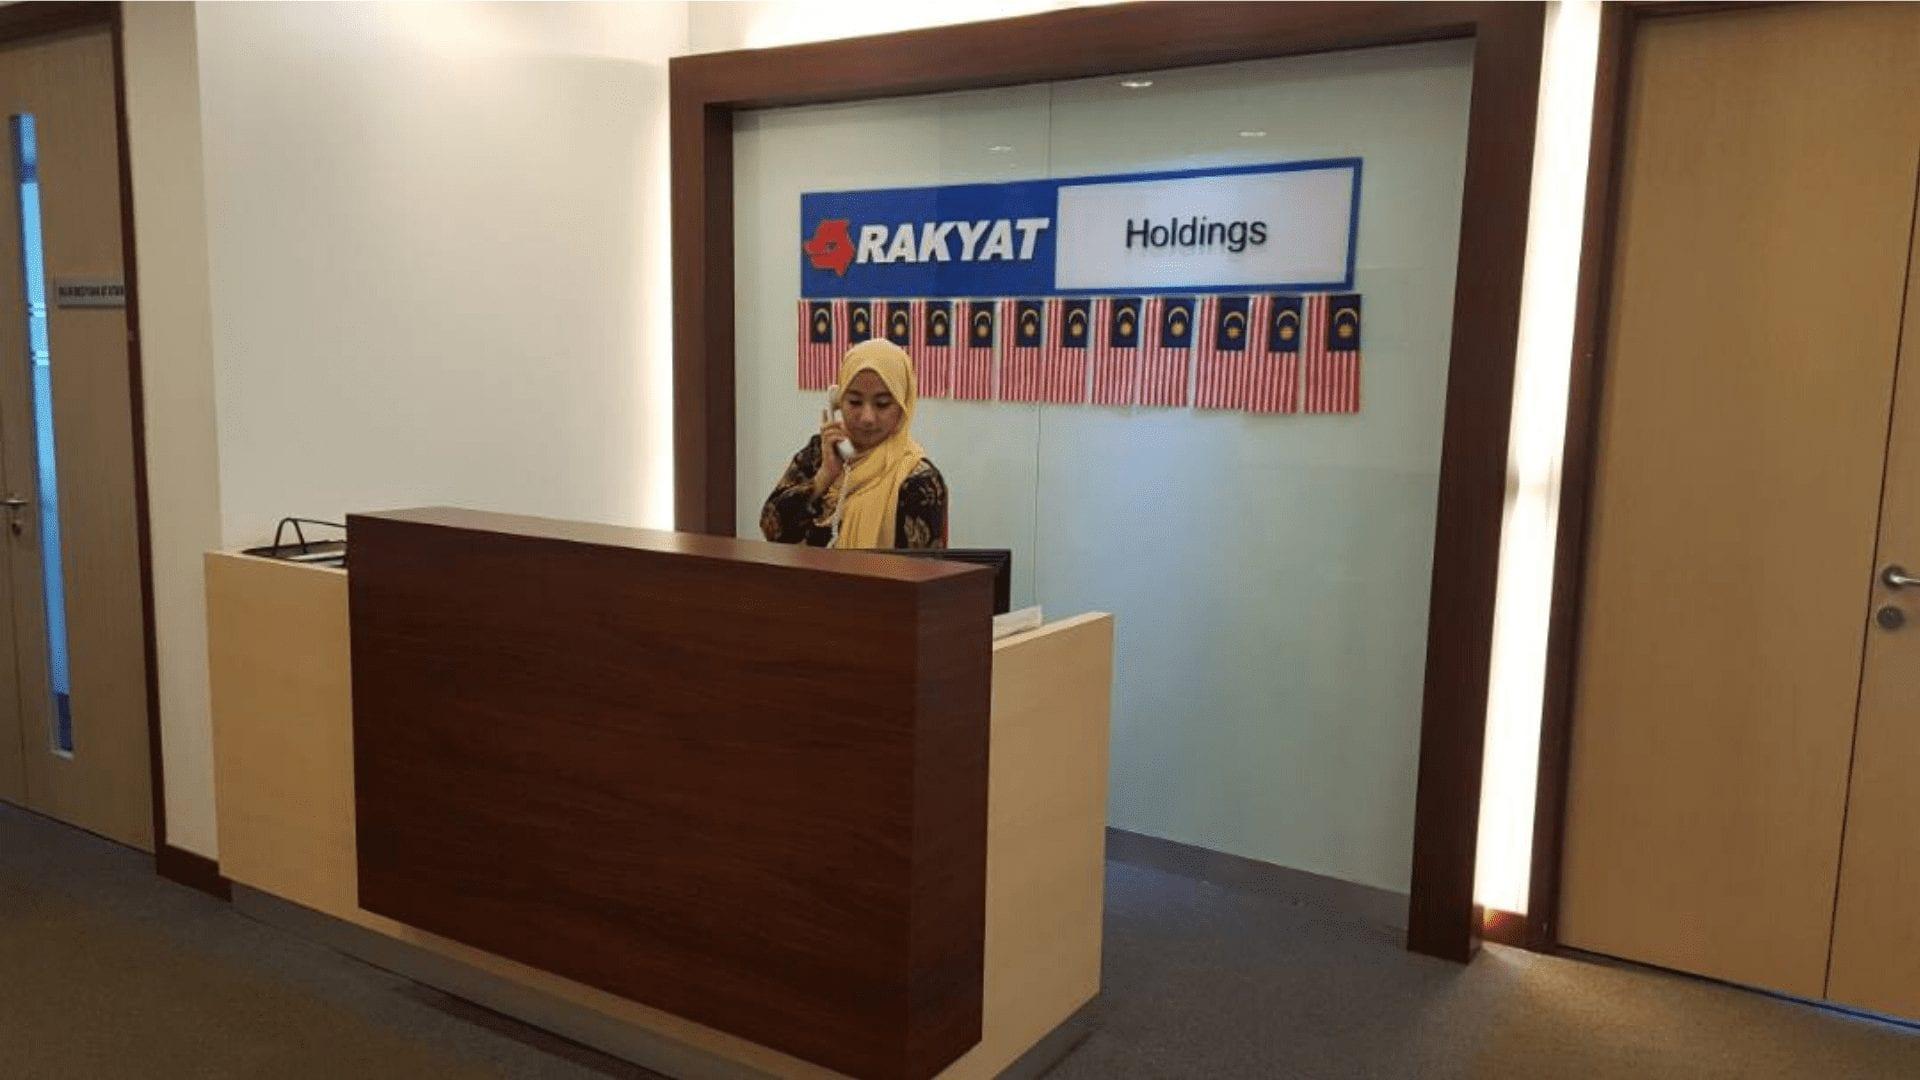 Rakyat Holdings Sdn Bhd